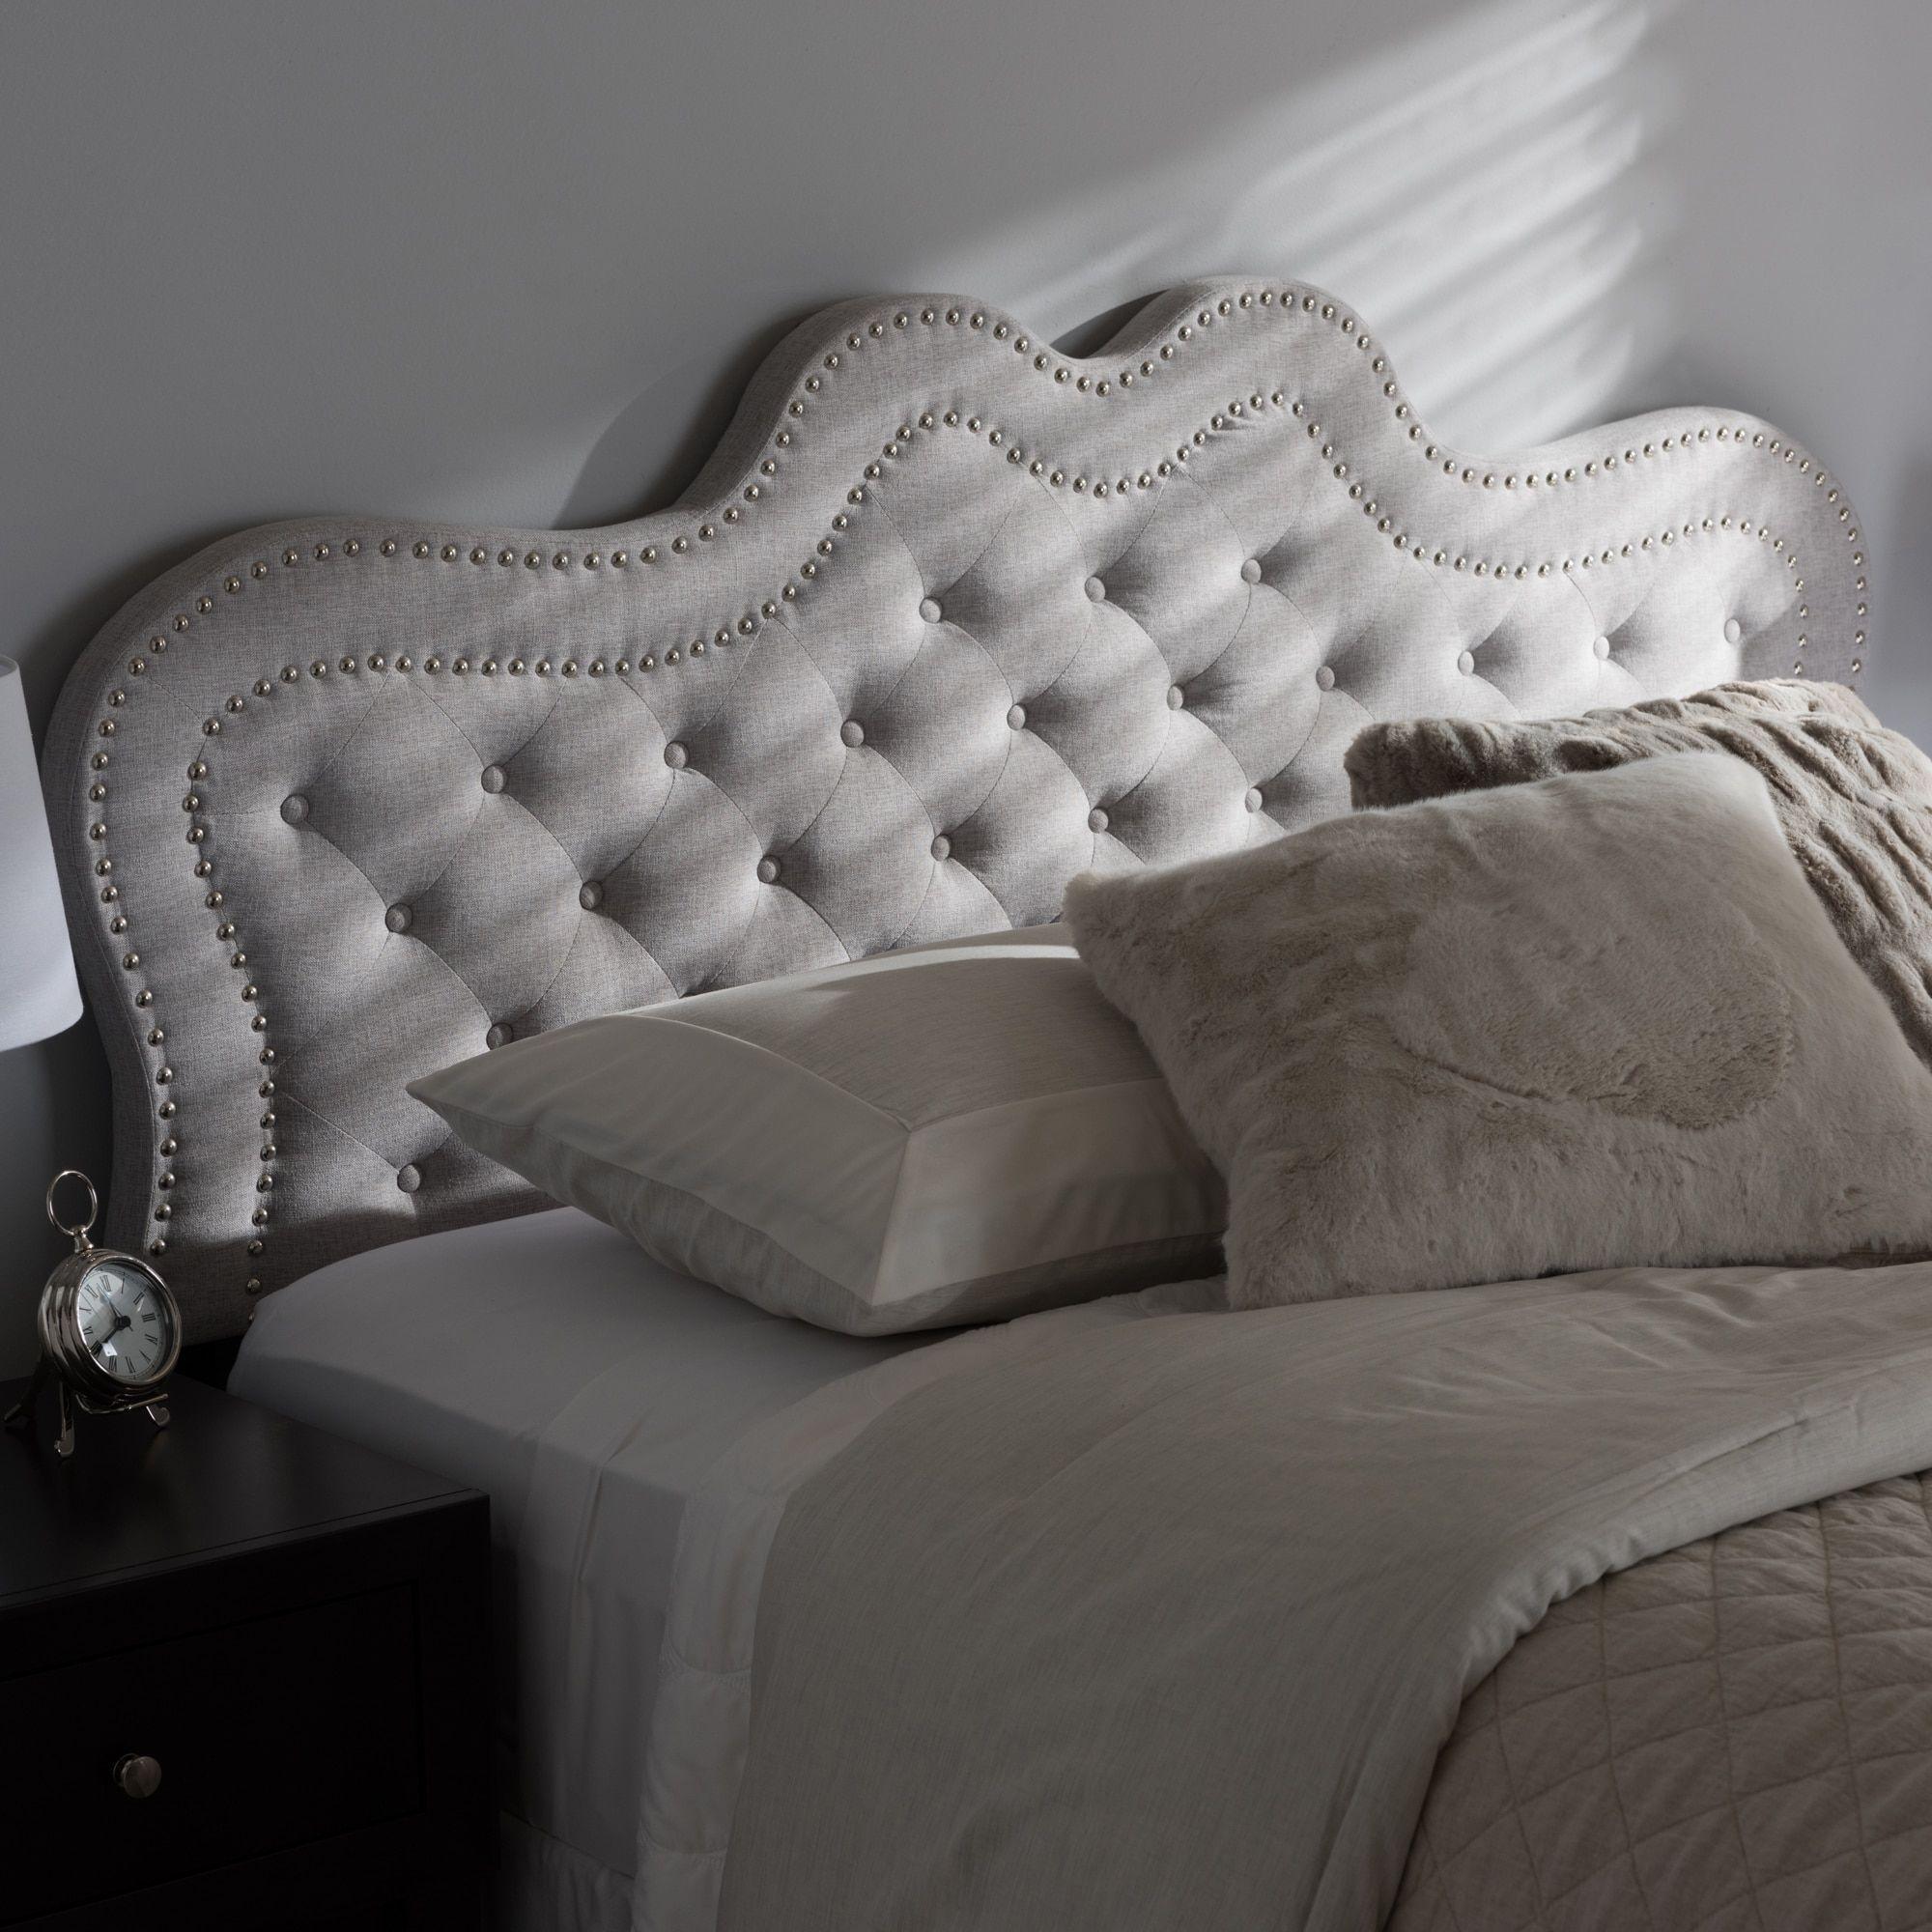 furniture save you fabric gray ll panel headboard headboards love upholstered corbett grey